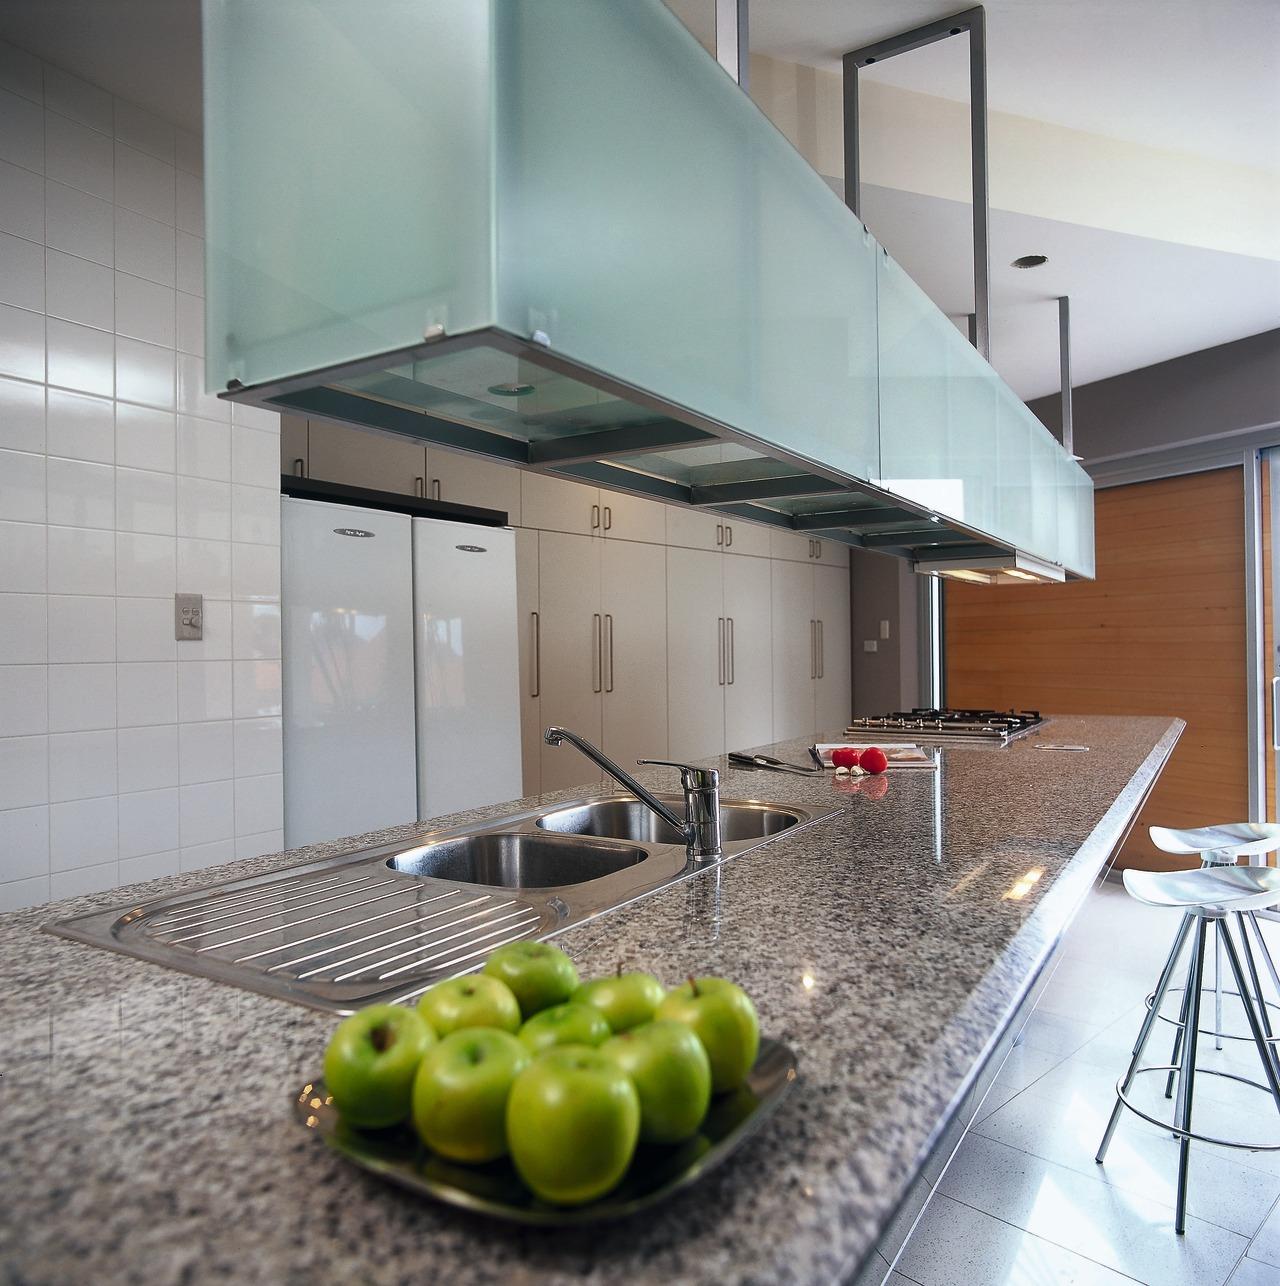 A granite benchtop under a glass storage unit architecture, countertop, house, interior design, kitchen, gray